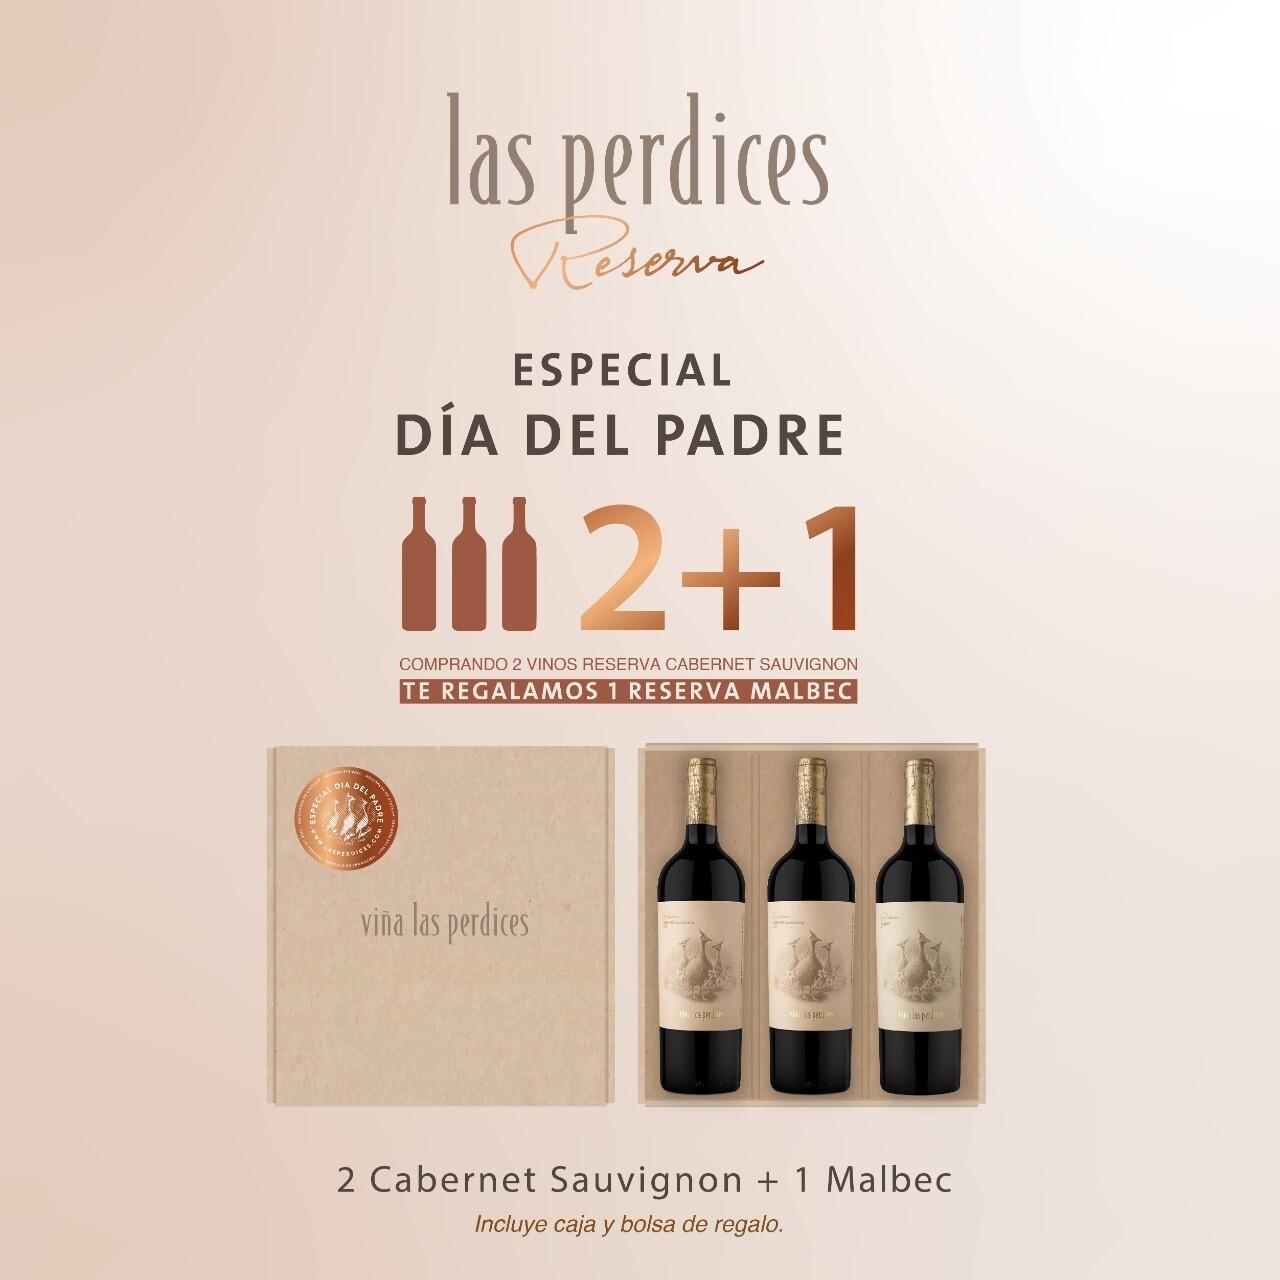 Estuche Reserva Las Perdices Dos Cabernet Sauvignon + Un Malbec